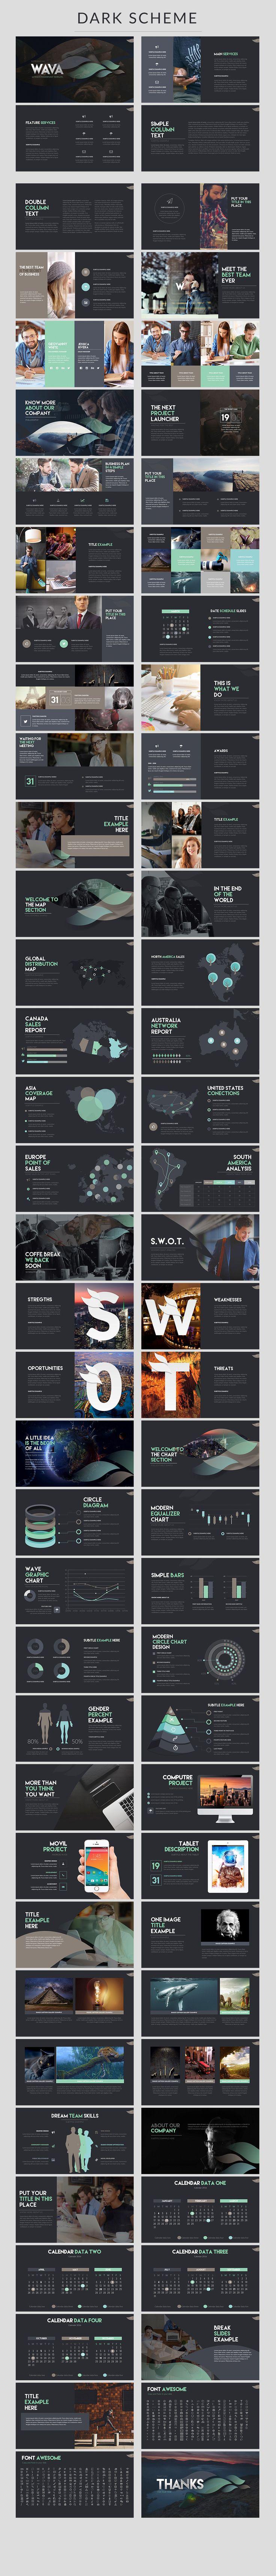 Wava | Keynote Template by Zacomic Studios on @creativemarket